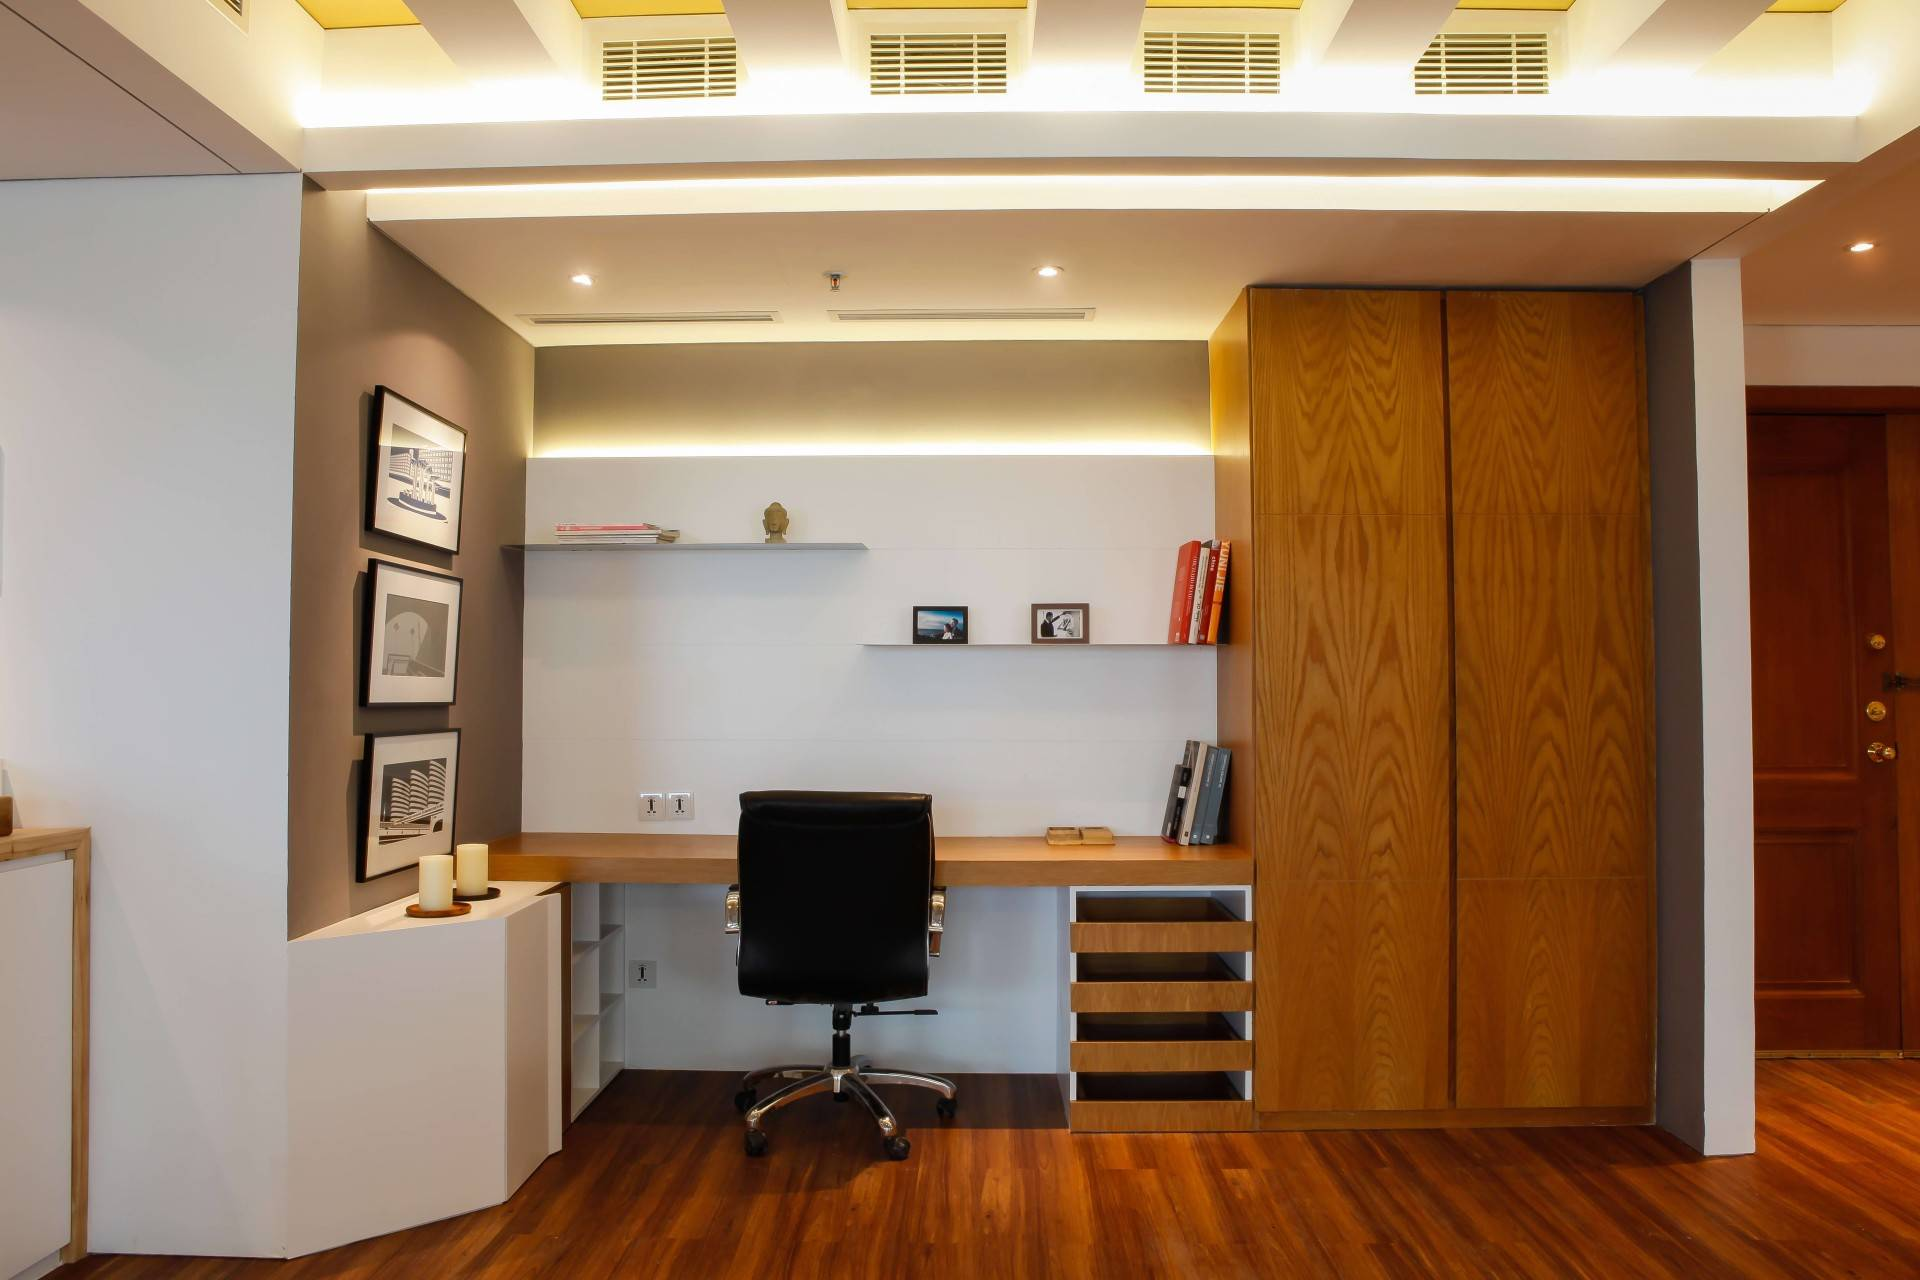 Design Intervention Pavilion Apartment At Kh Mas Mansyur Jakarta Jakarta Work Room Minimalis,modern,industrial,glass  2587